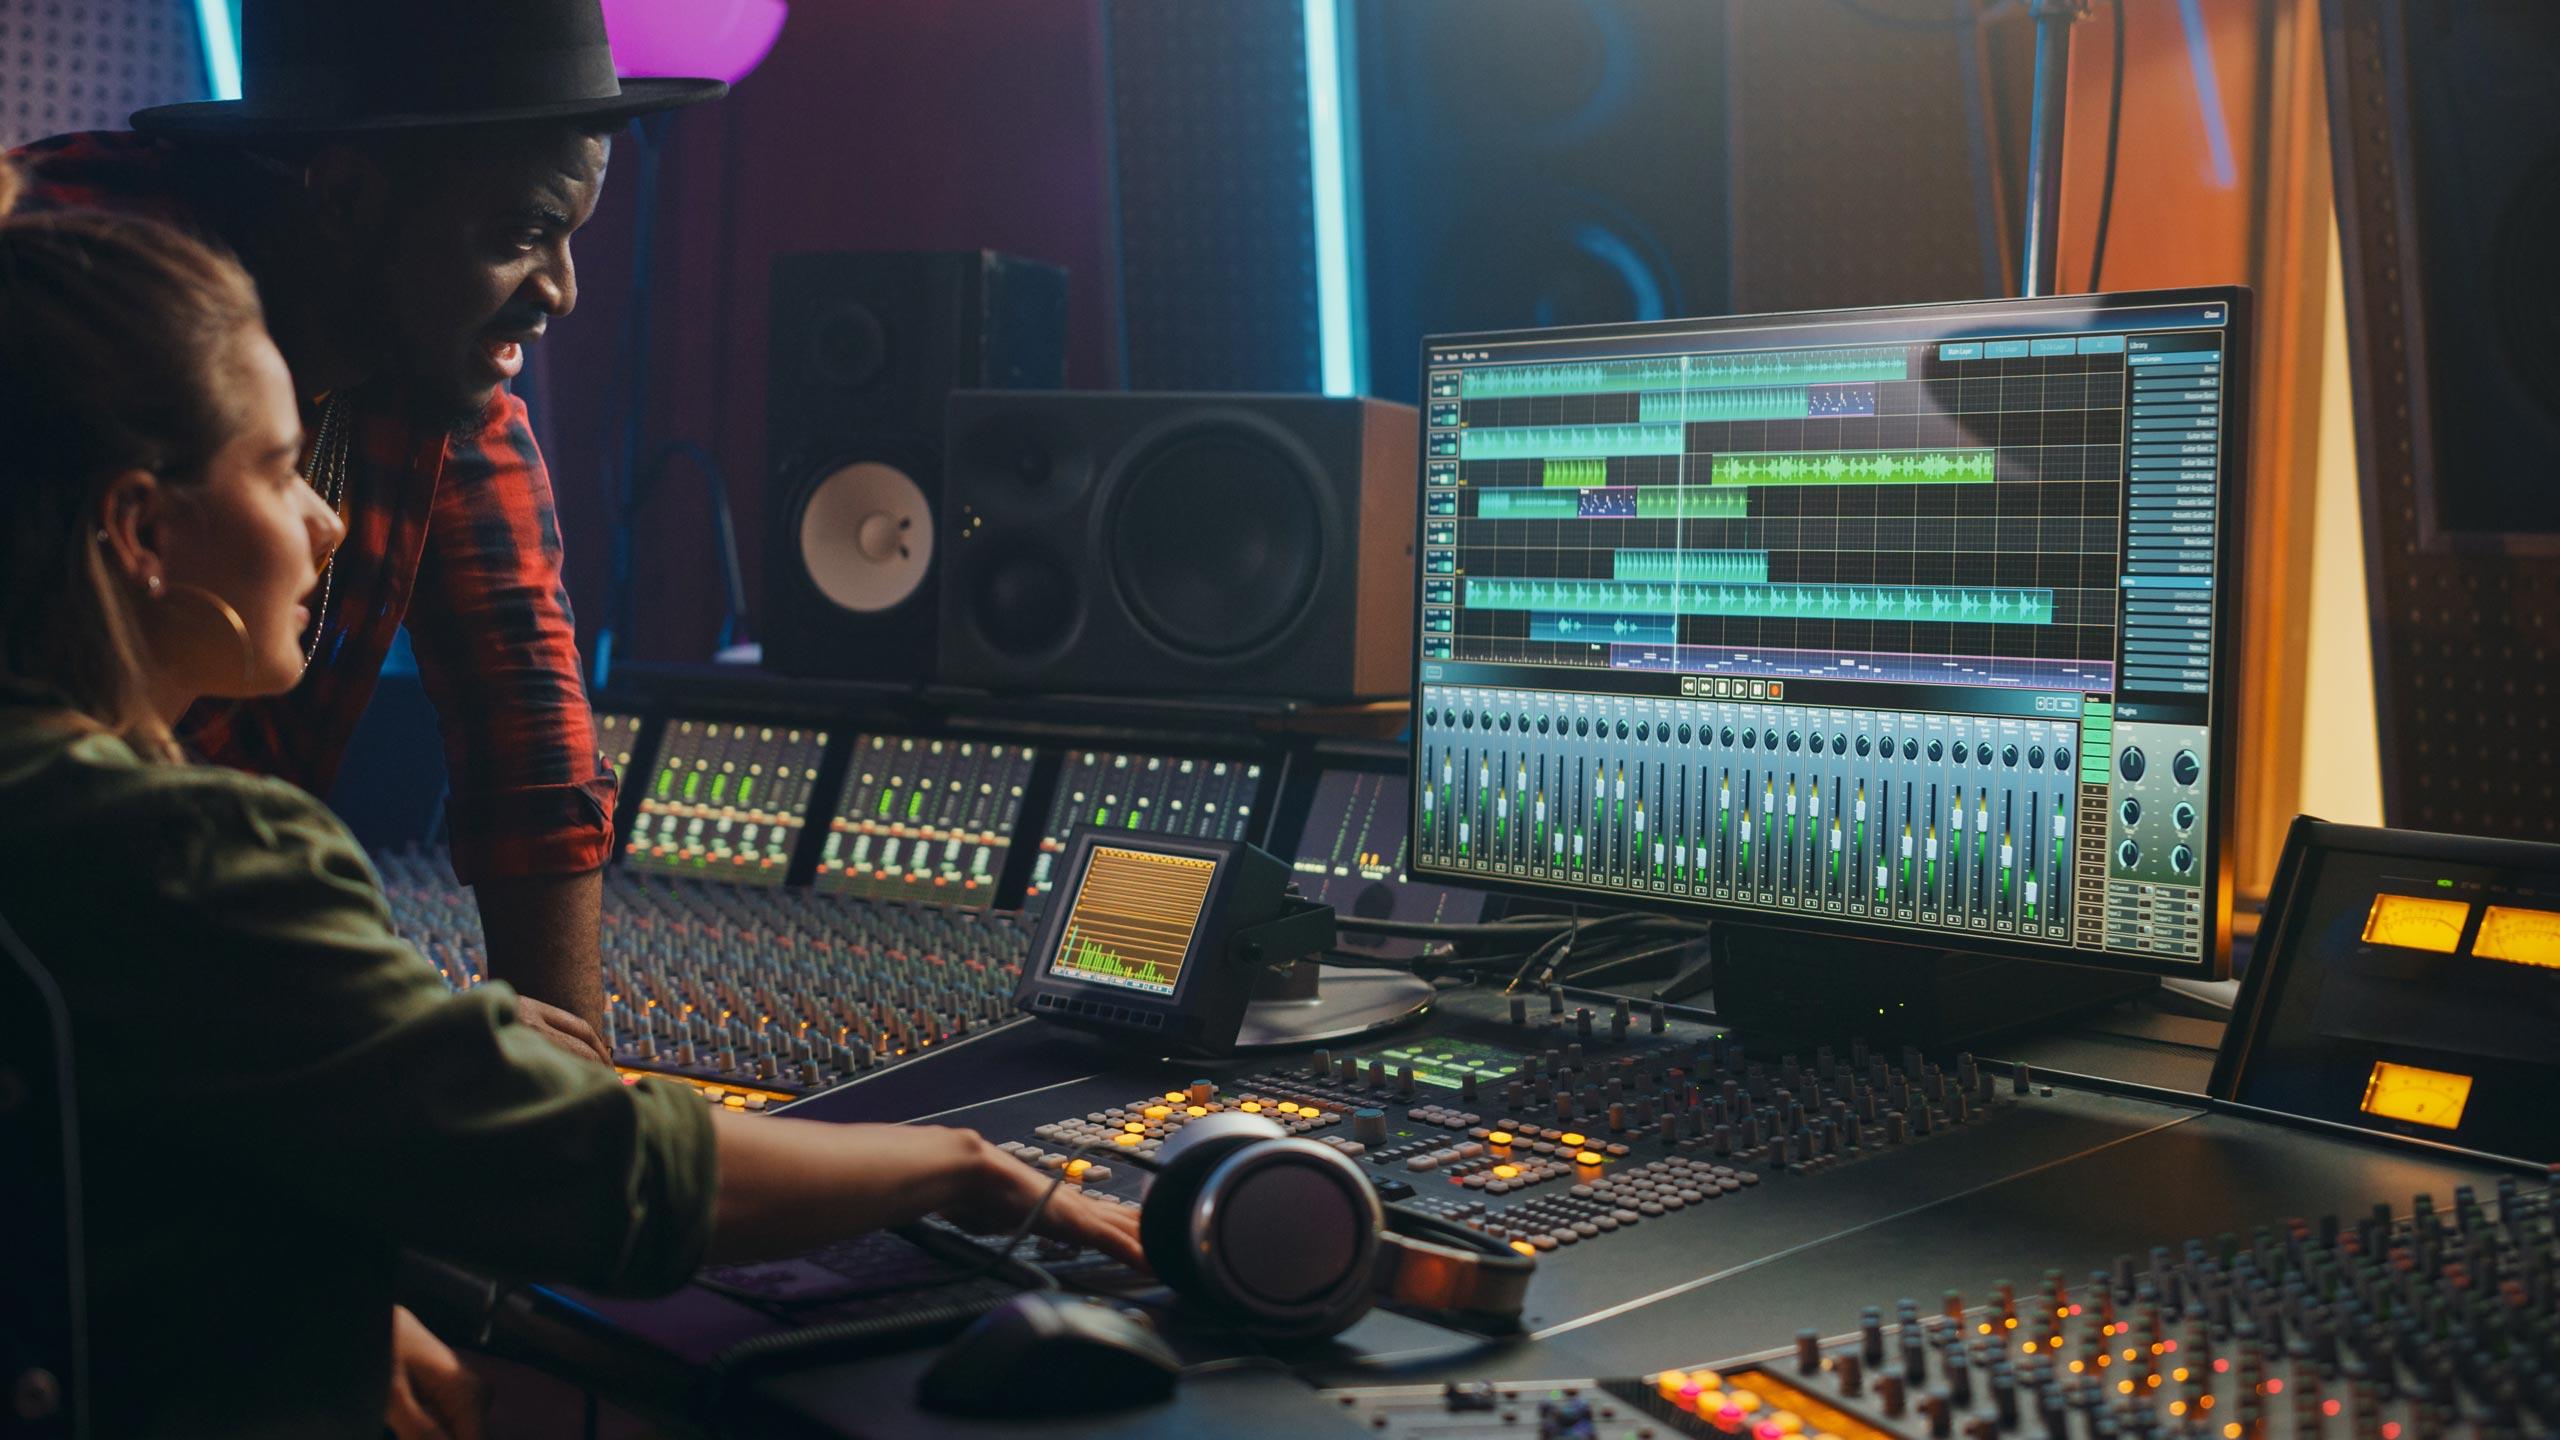 Dirac Live Studio audio for creatives